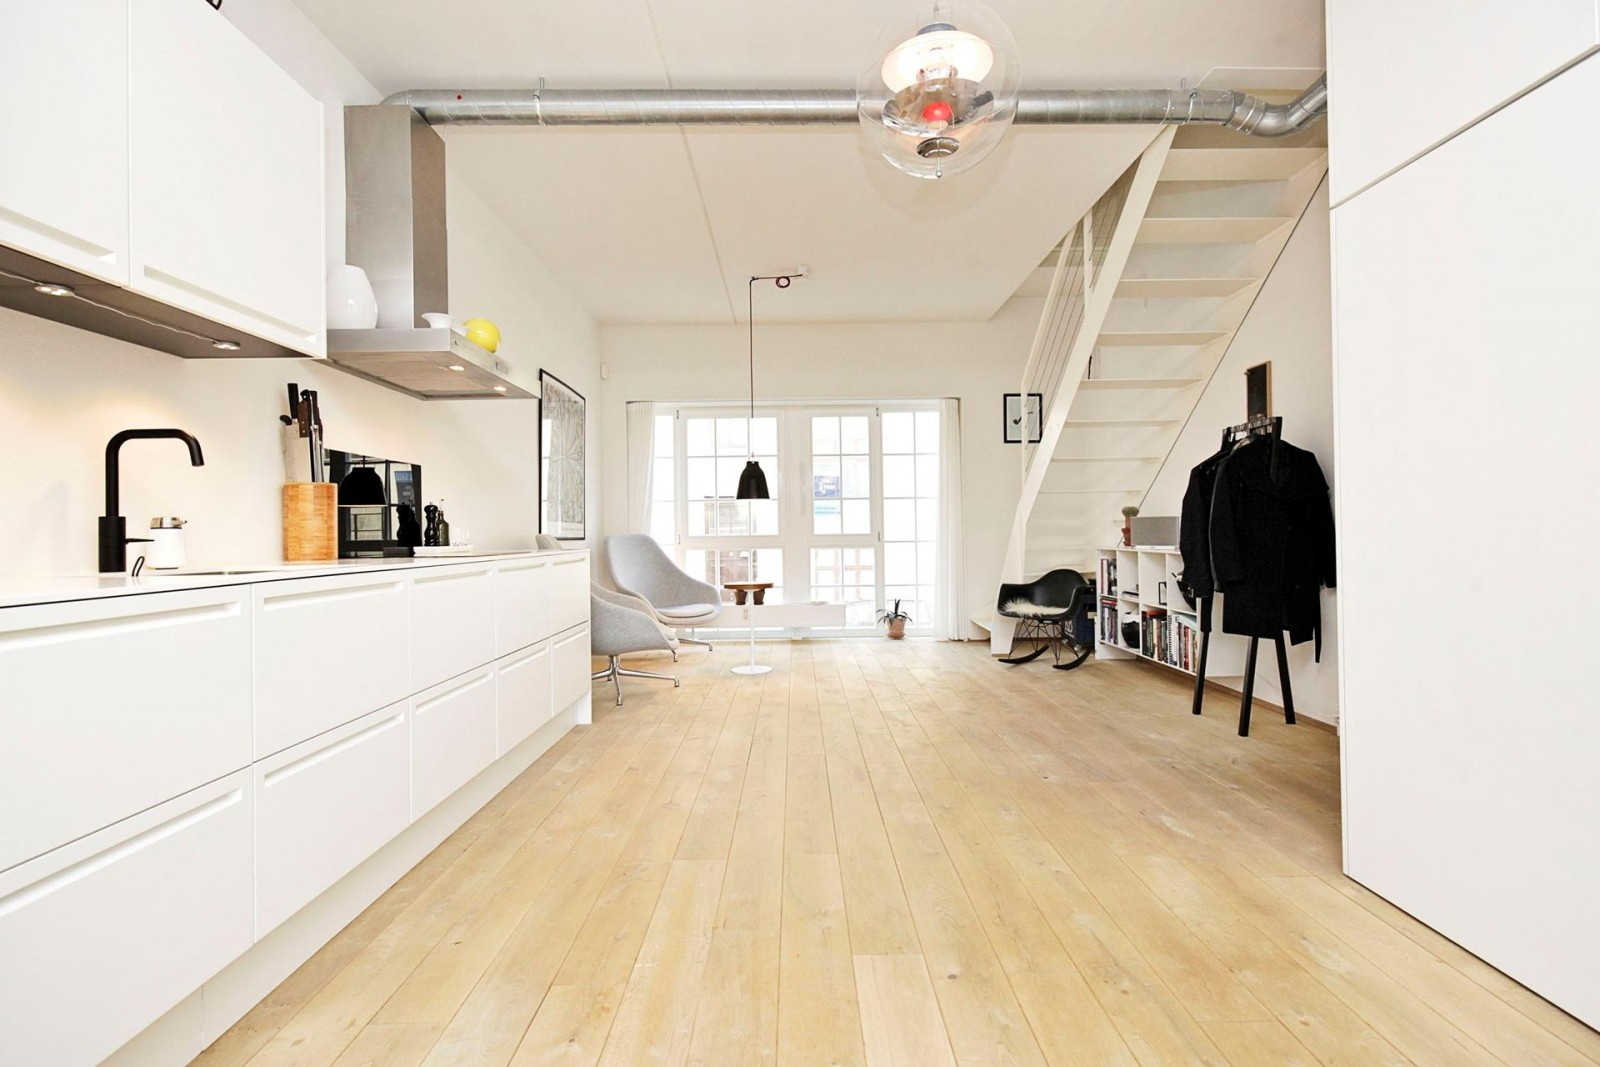 Halgreensgade, Copenhagen S - Housing Company ApS